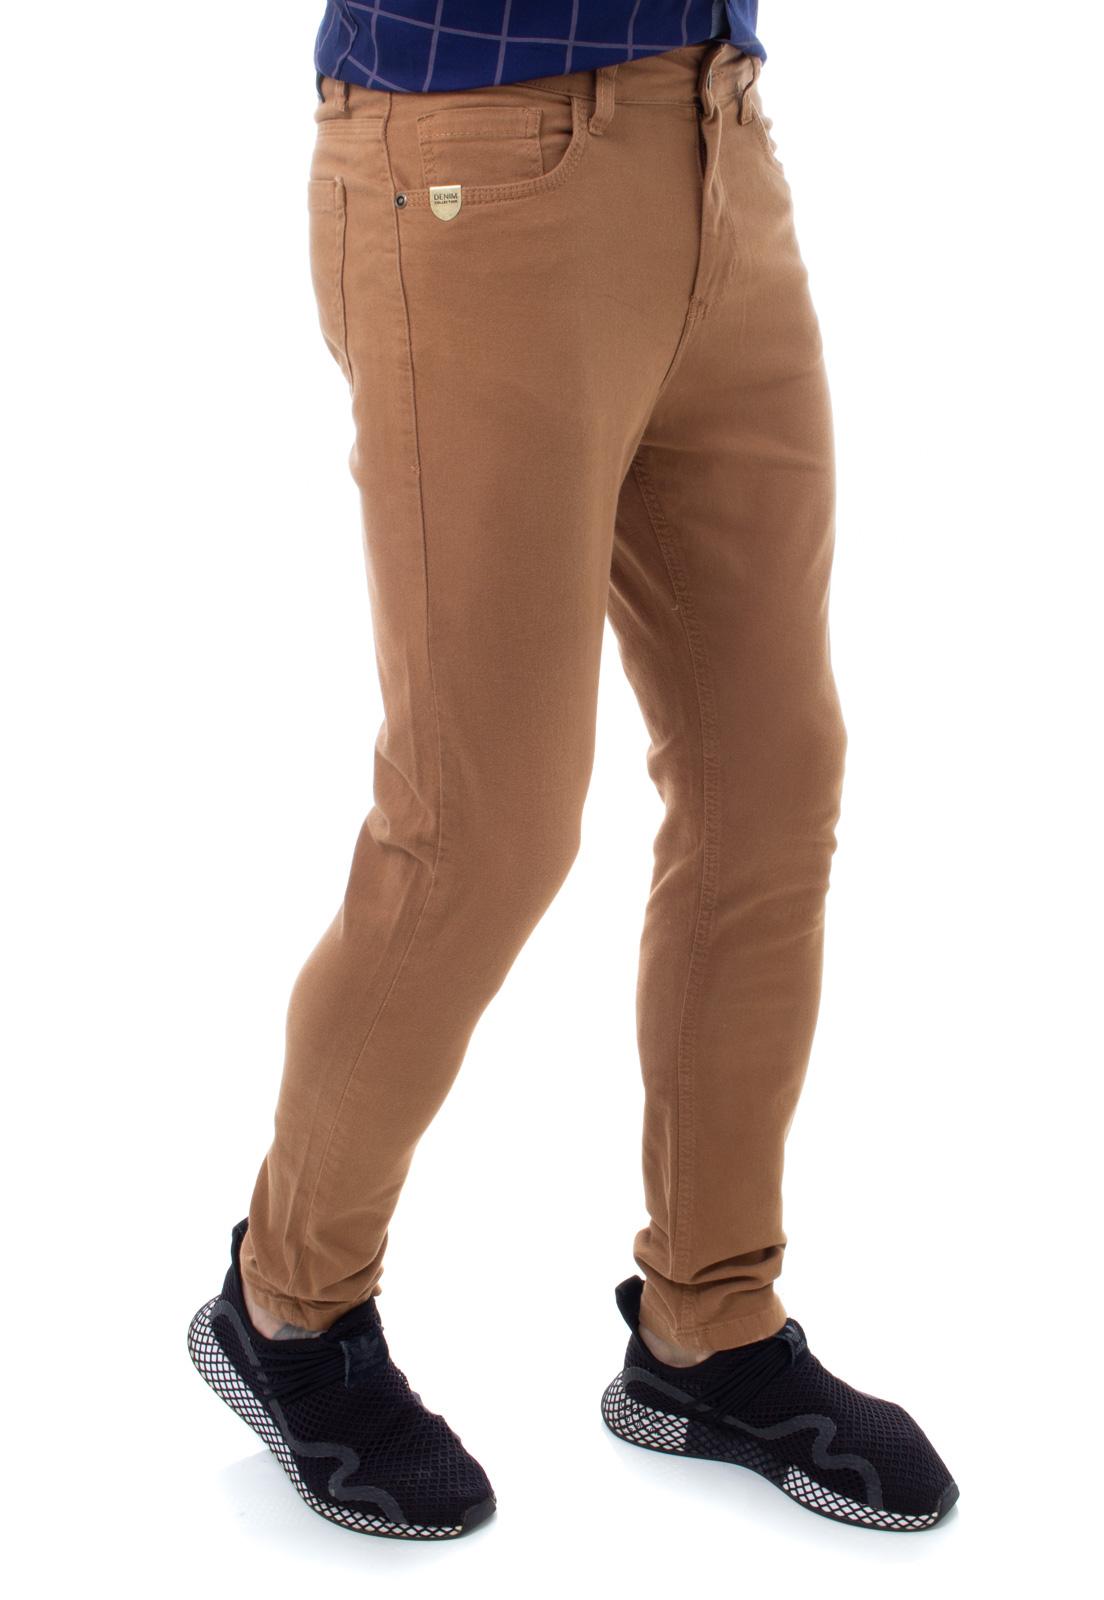 Calça Masculina Confort - 48134  - CROCKER JEANS